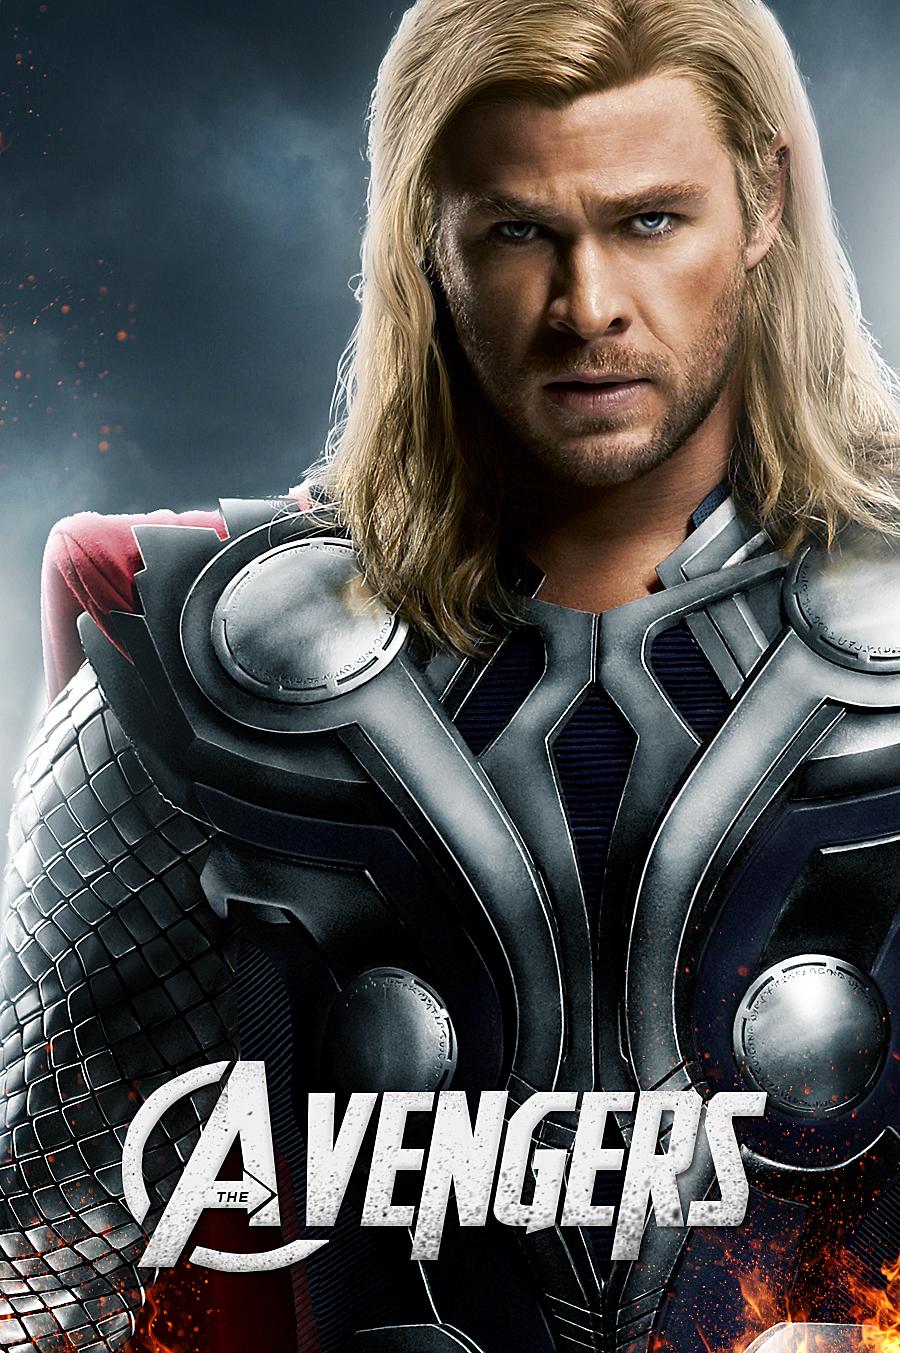 the avengers thor - photo #18